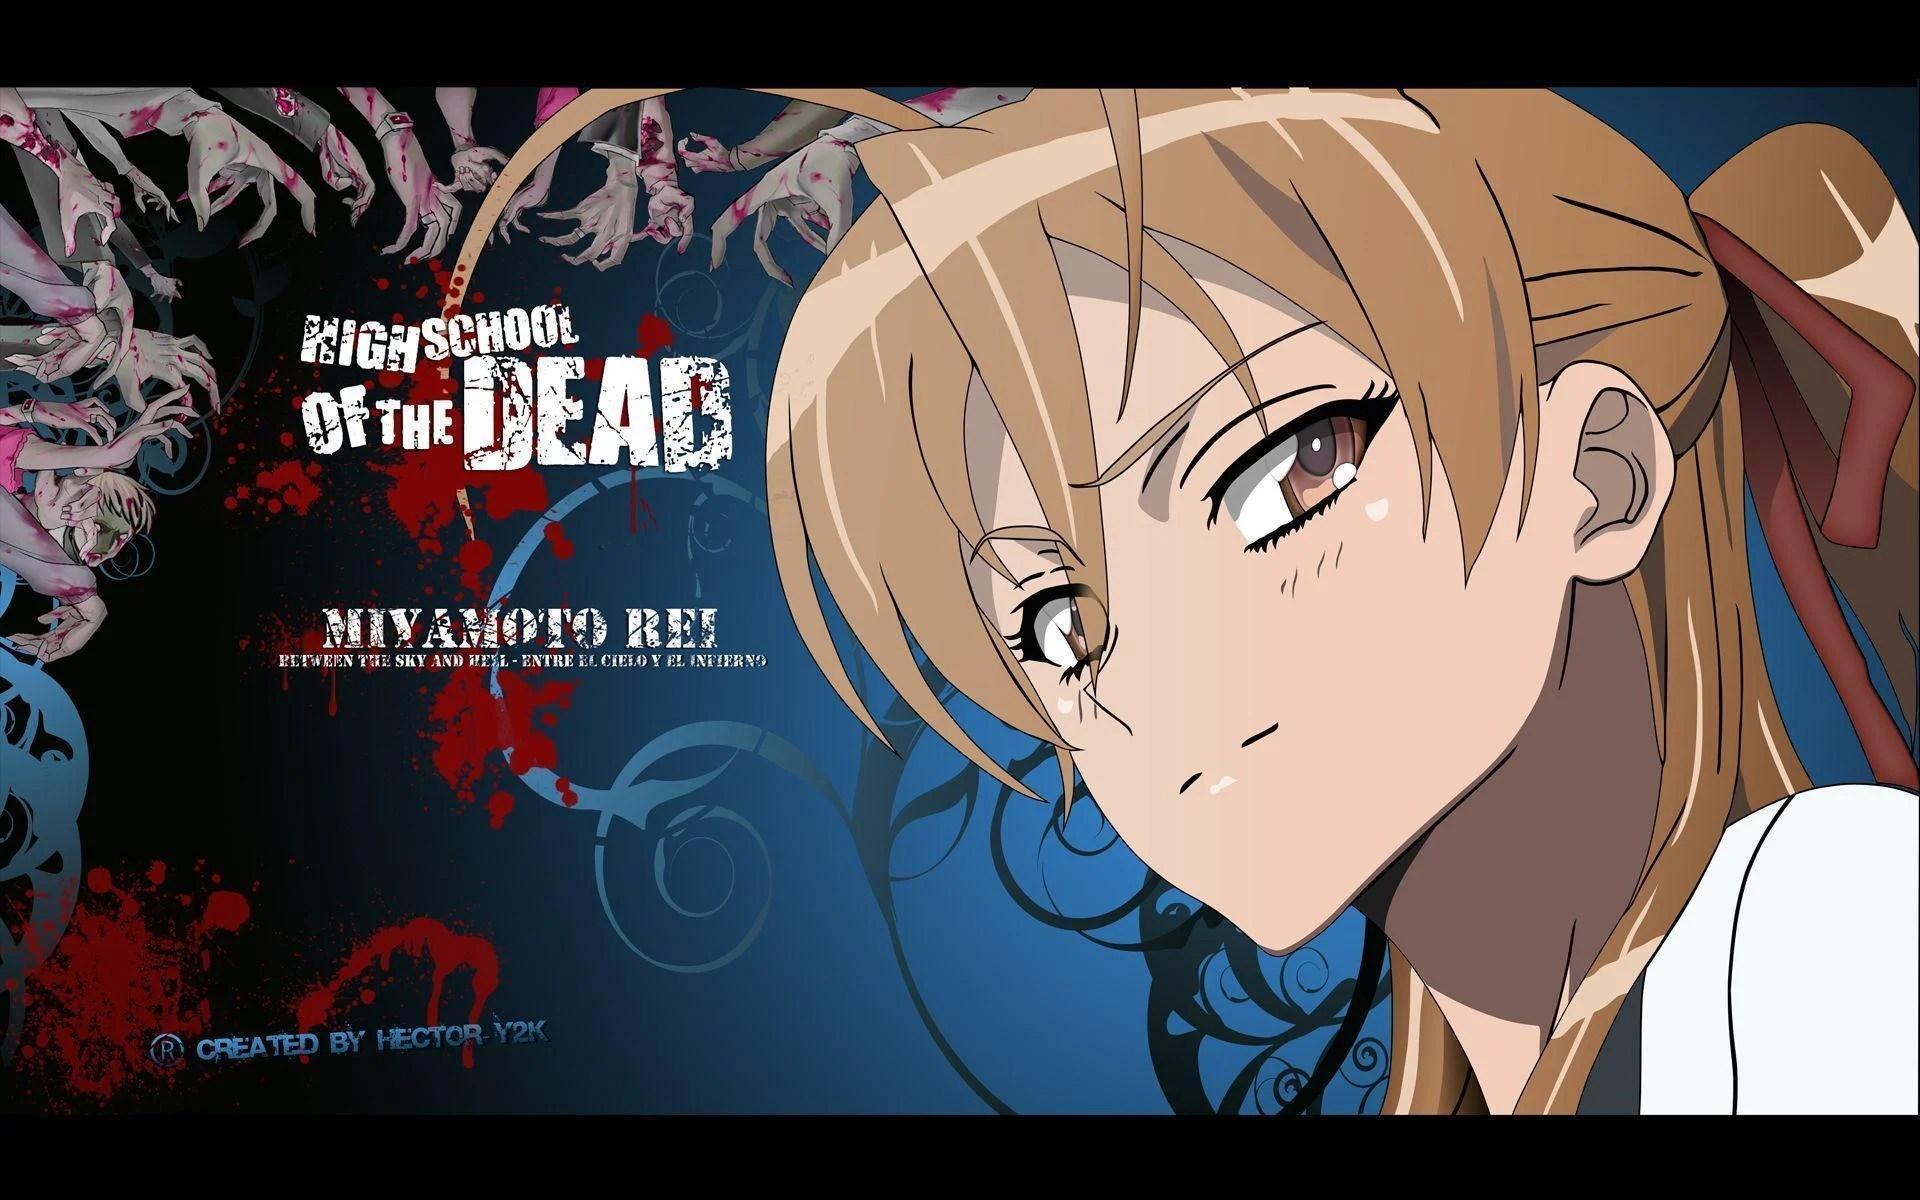 Highschool of the dead, hotd, saya takagi, anime, hd wallpaper. Highschool Of The Dead Wallpapers - Wallpaper Cave